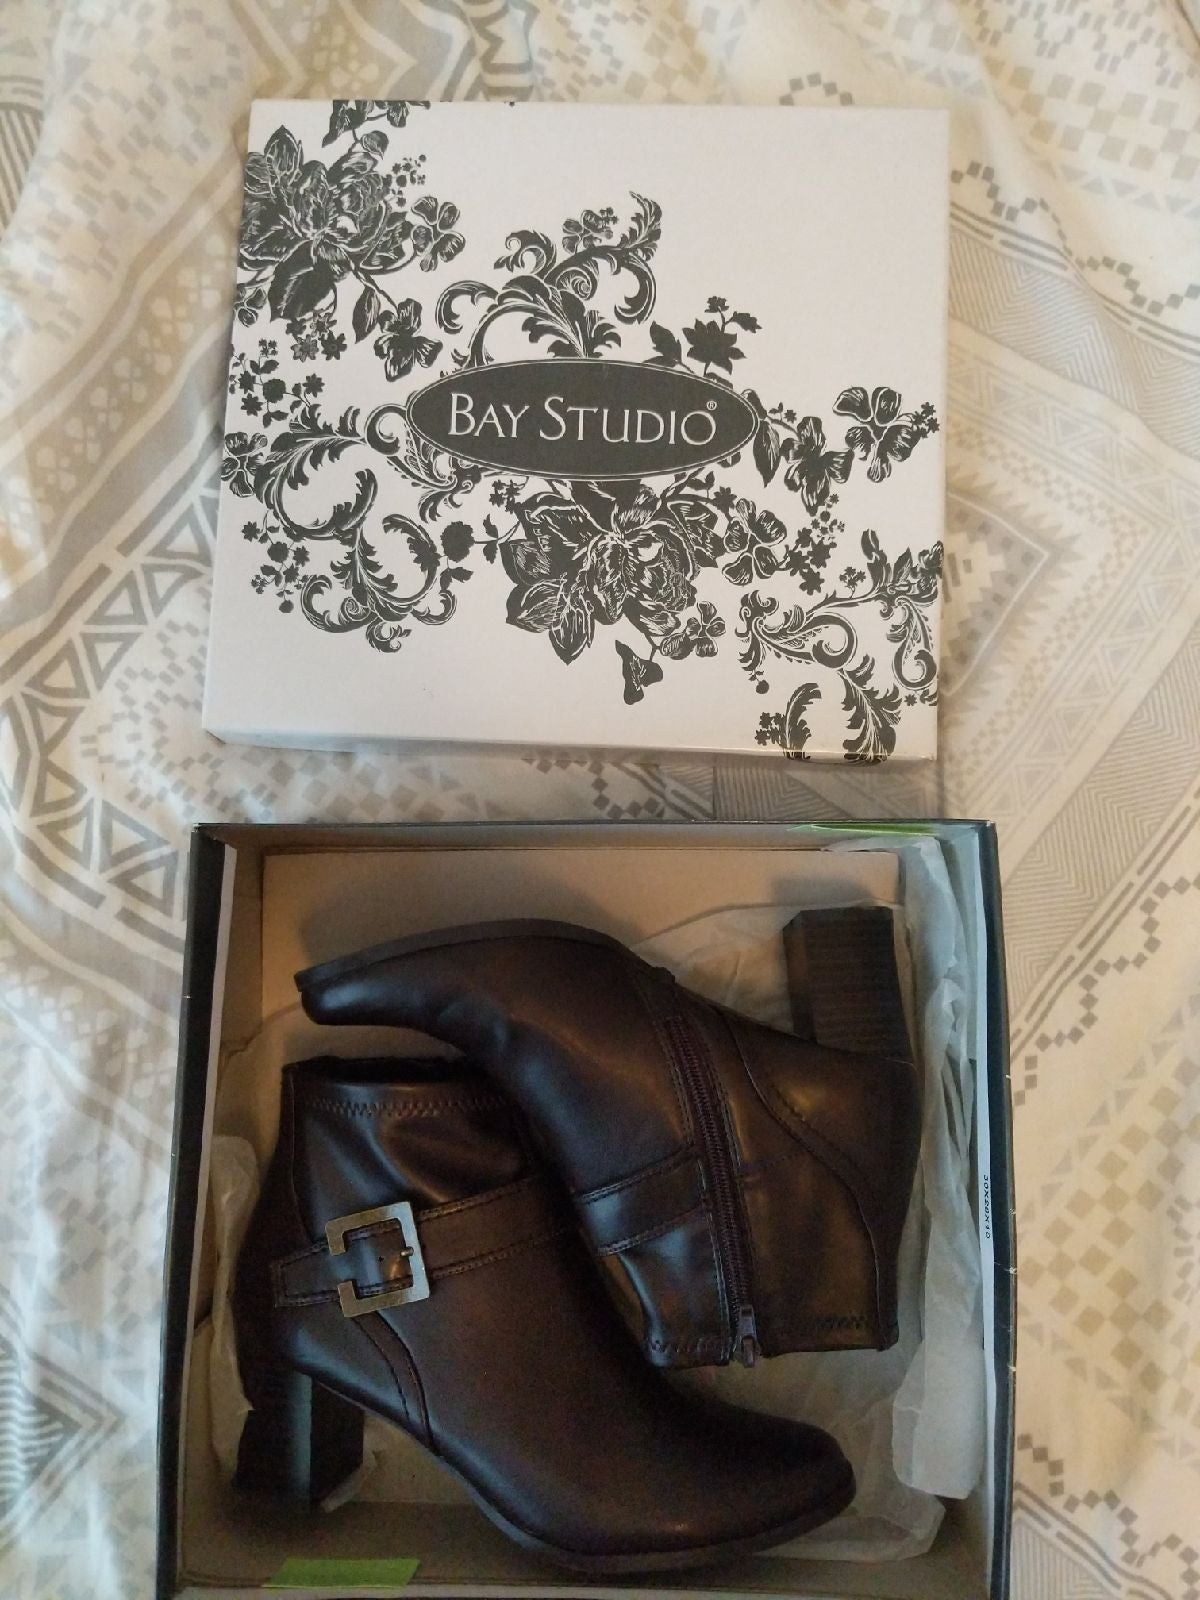 Bay studio Kelly heeled booties